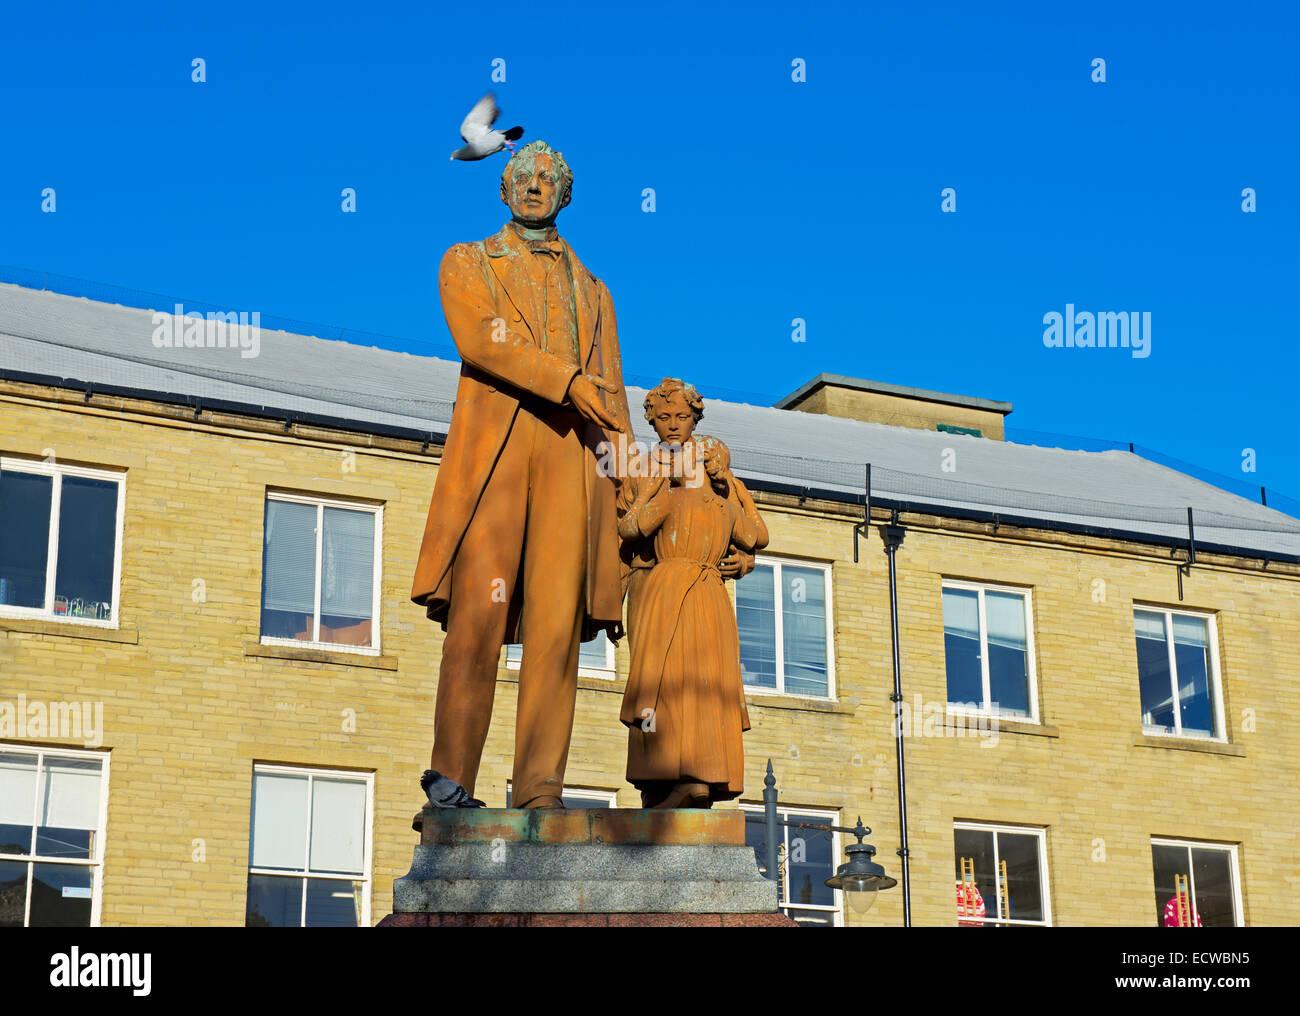 Statue von Richard Oastler, Bradford, West Yorkshire, England UK Stockbild